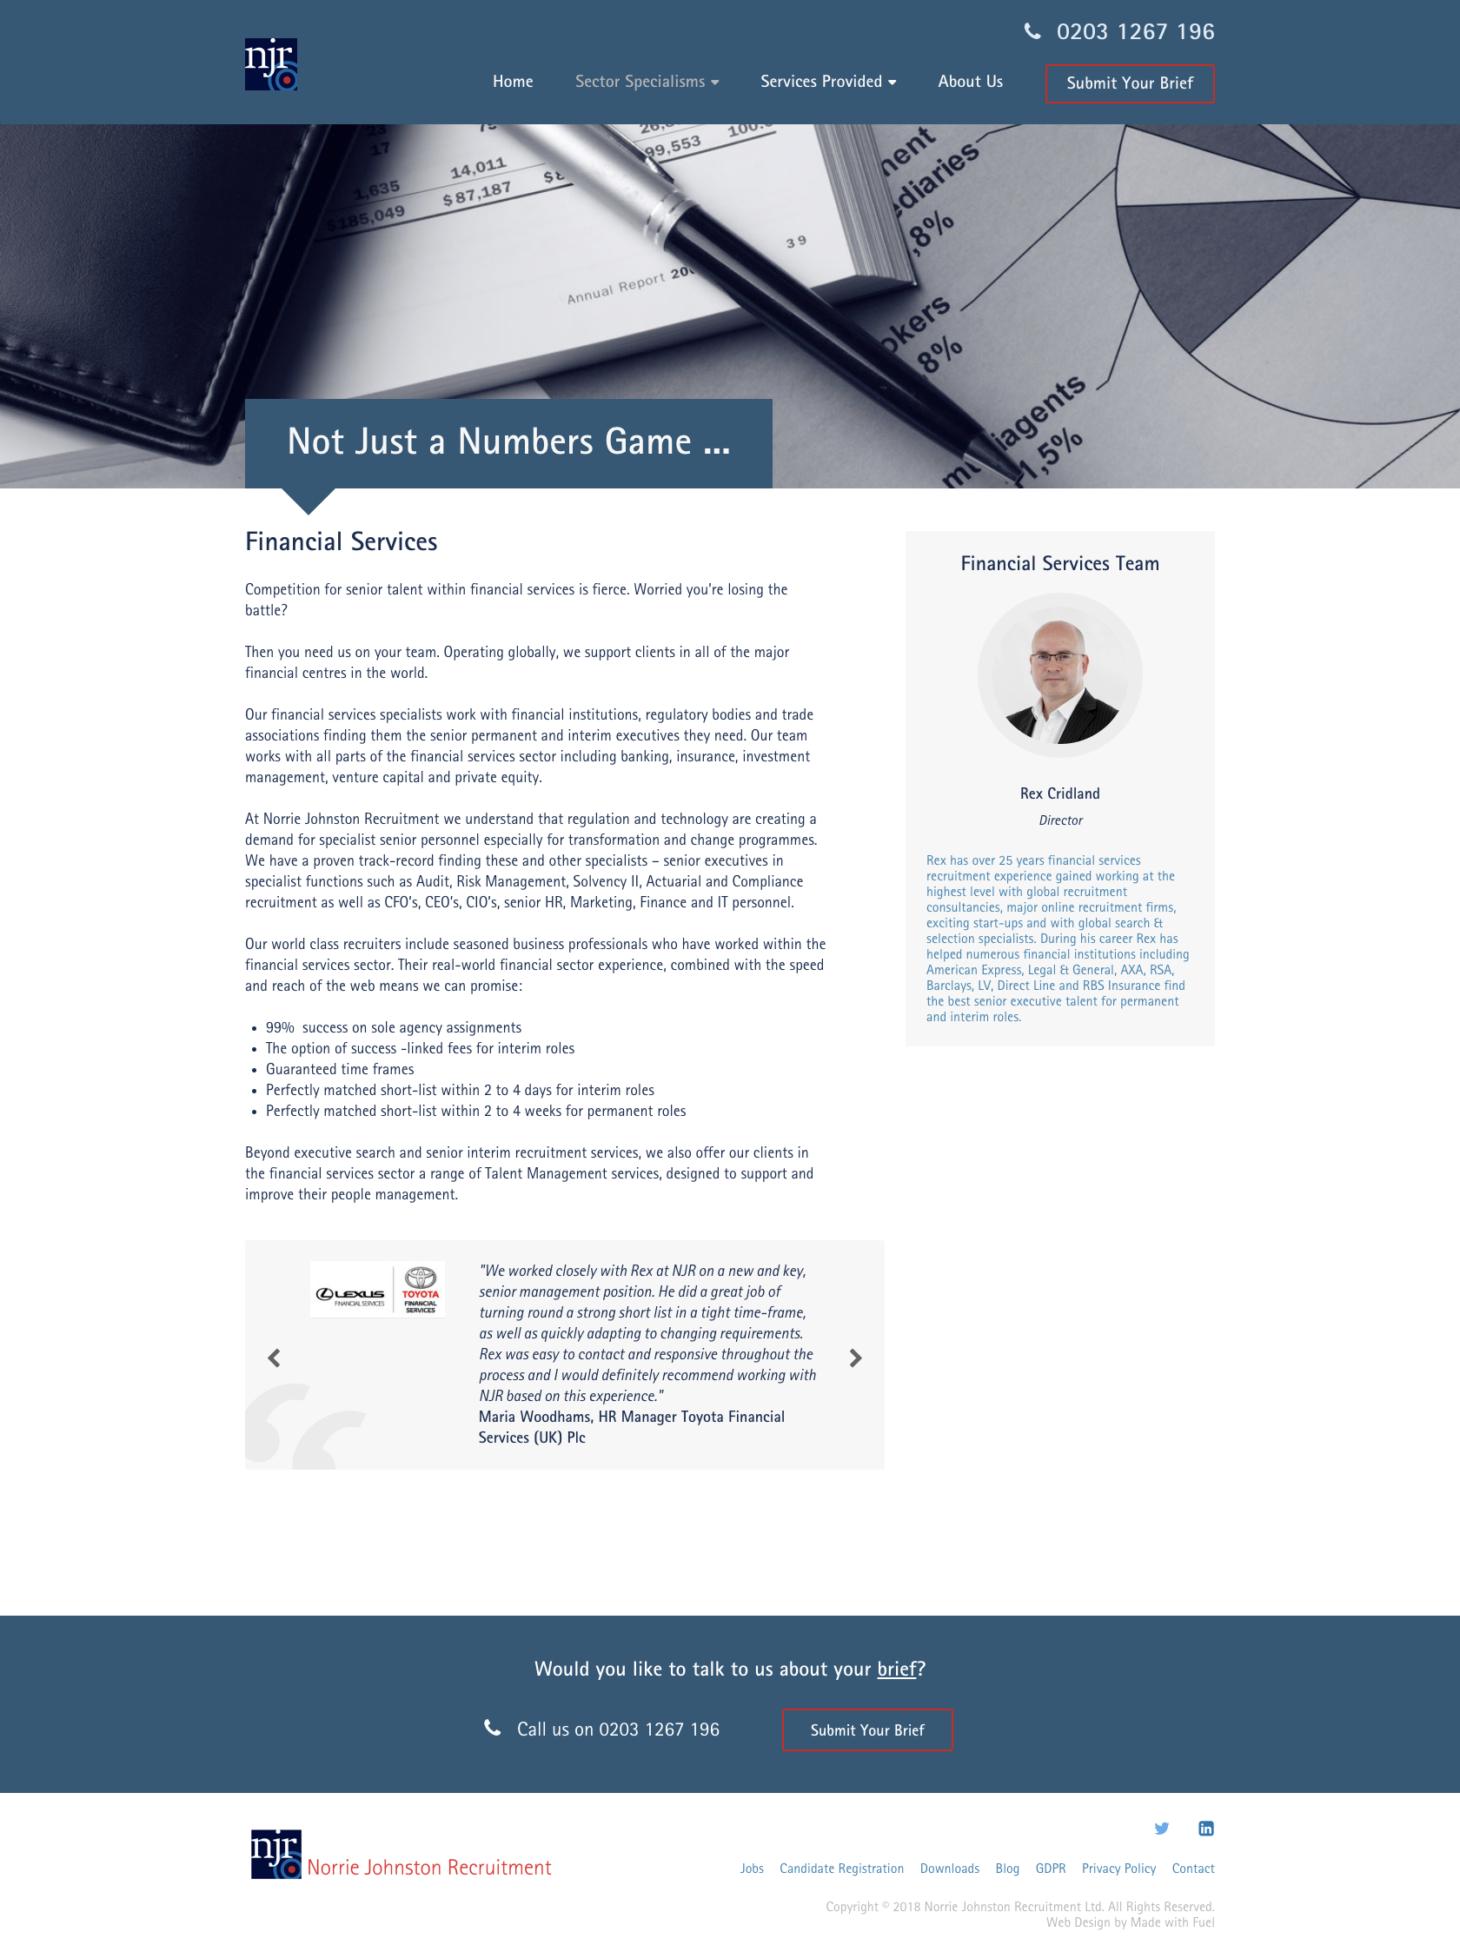 Norrie Johnston Recruitment - Services